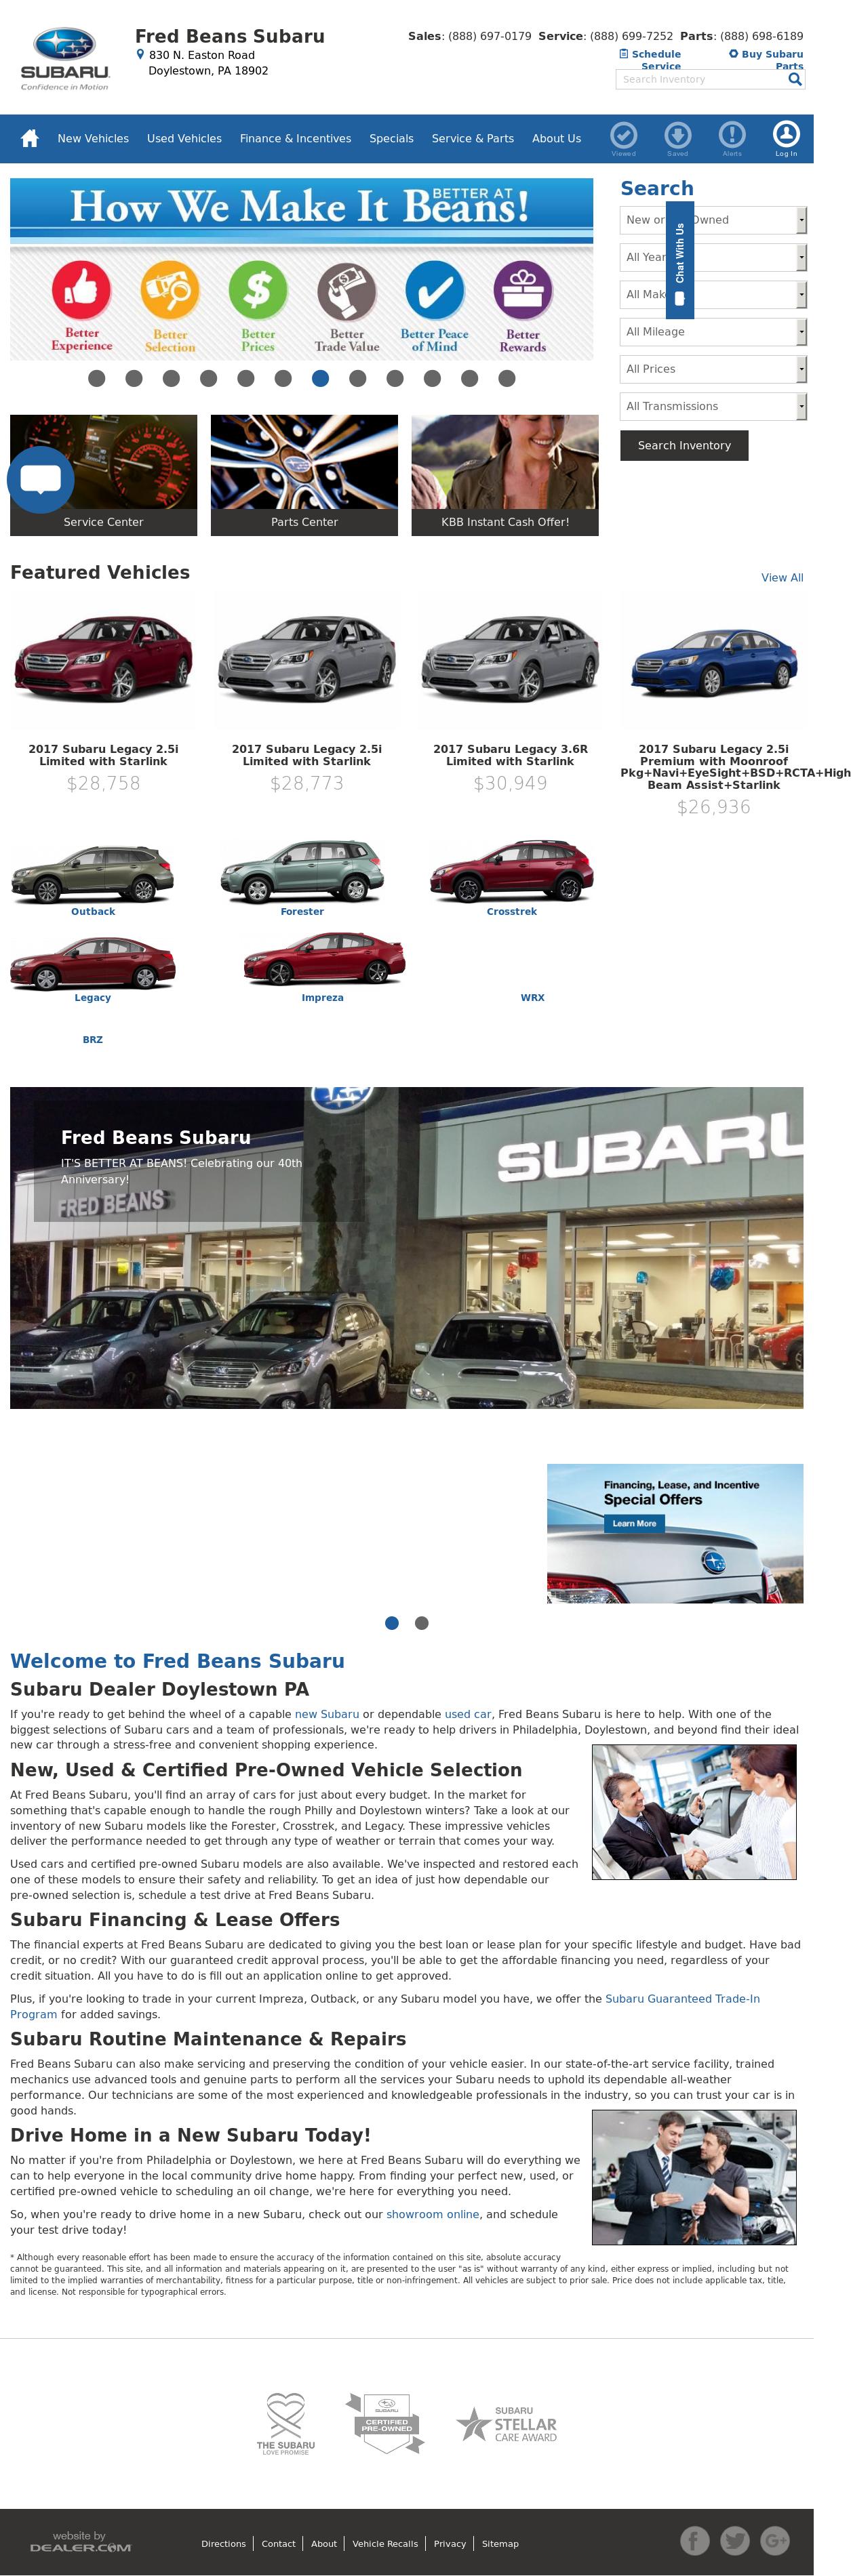 Fred Beans Subaru >> White Bear Subaru | News of New Car Release